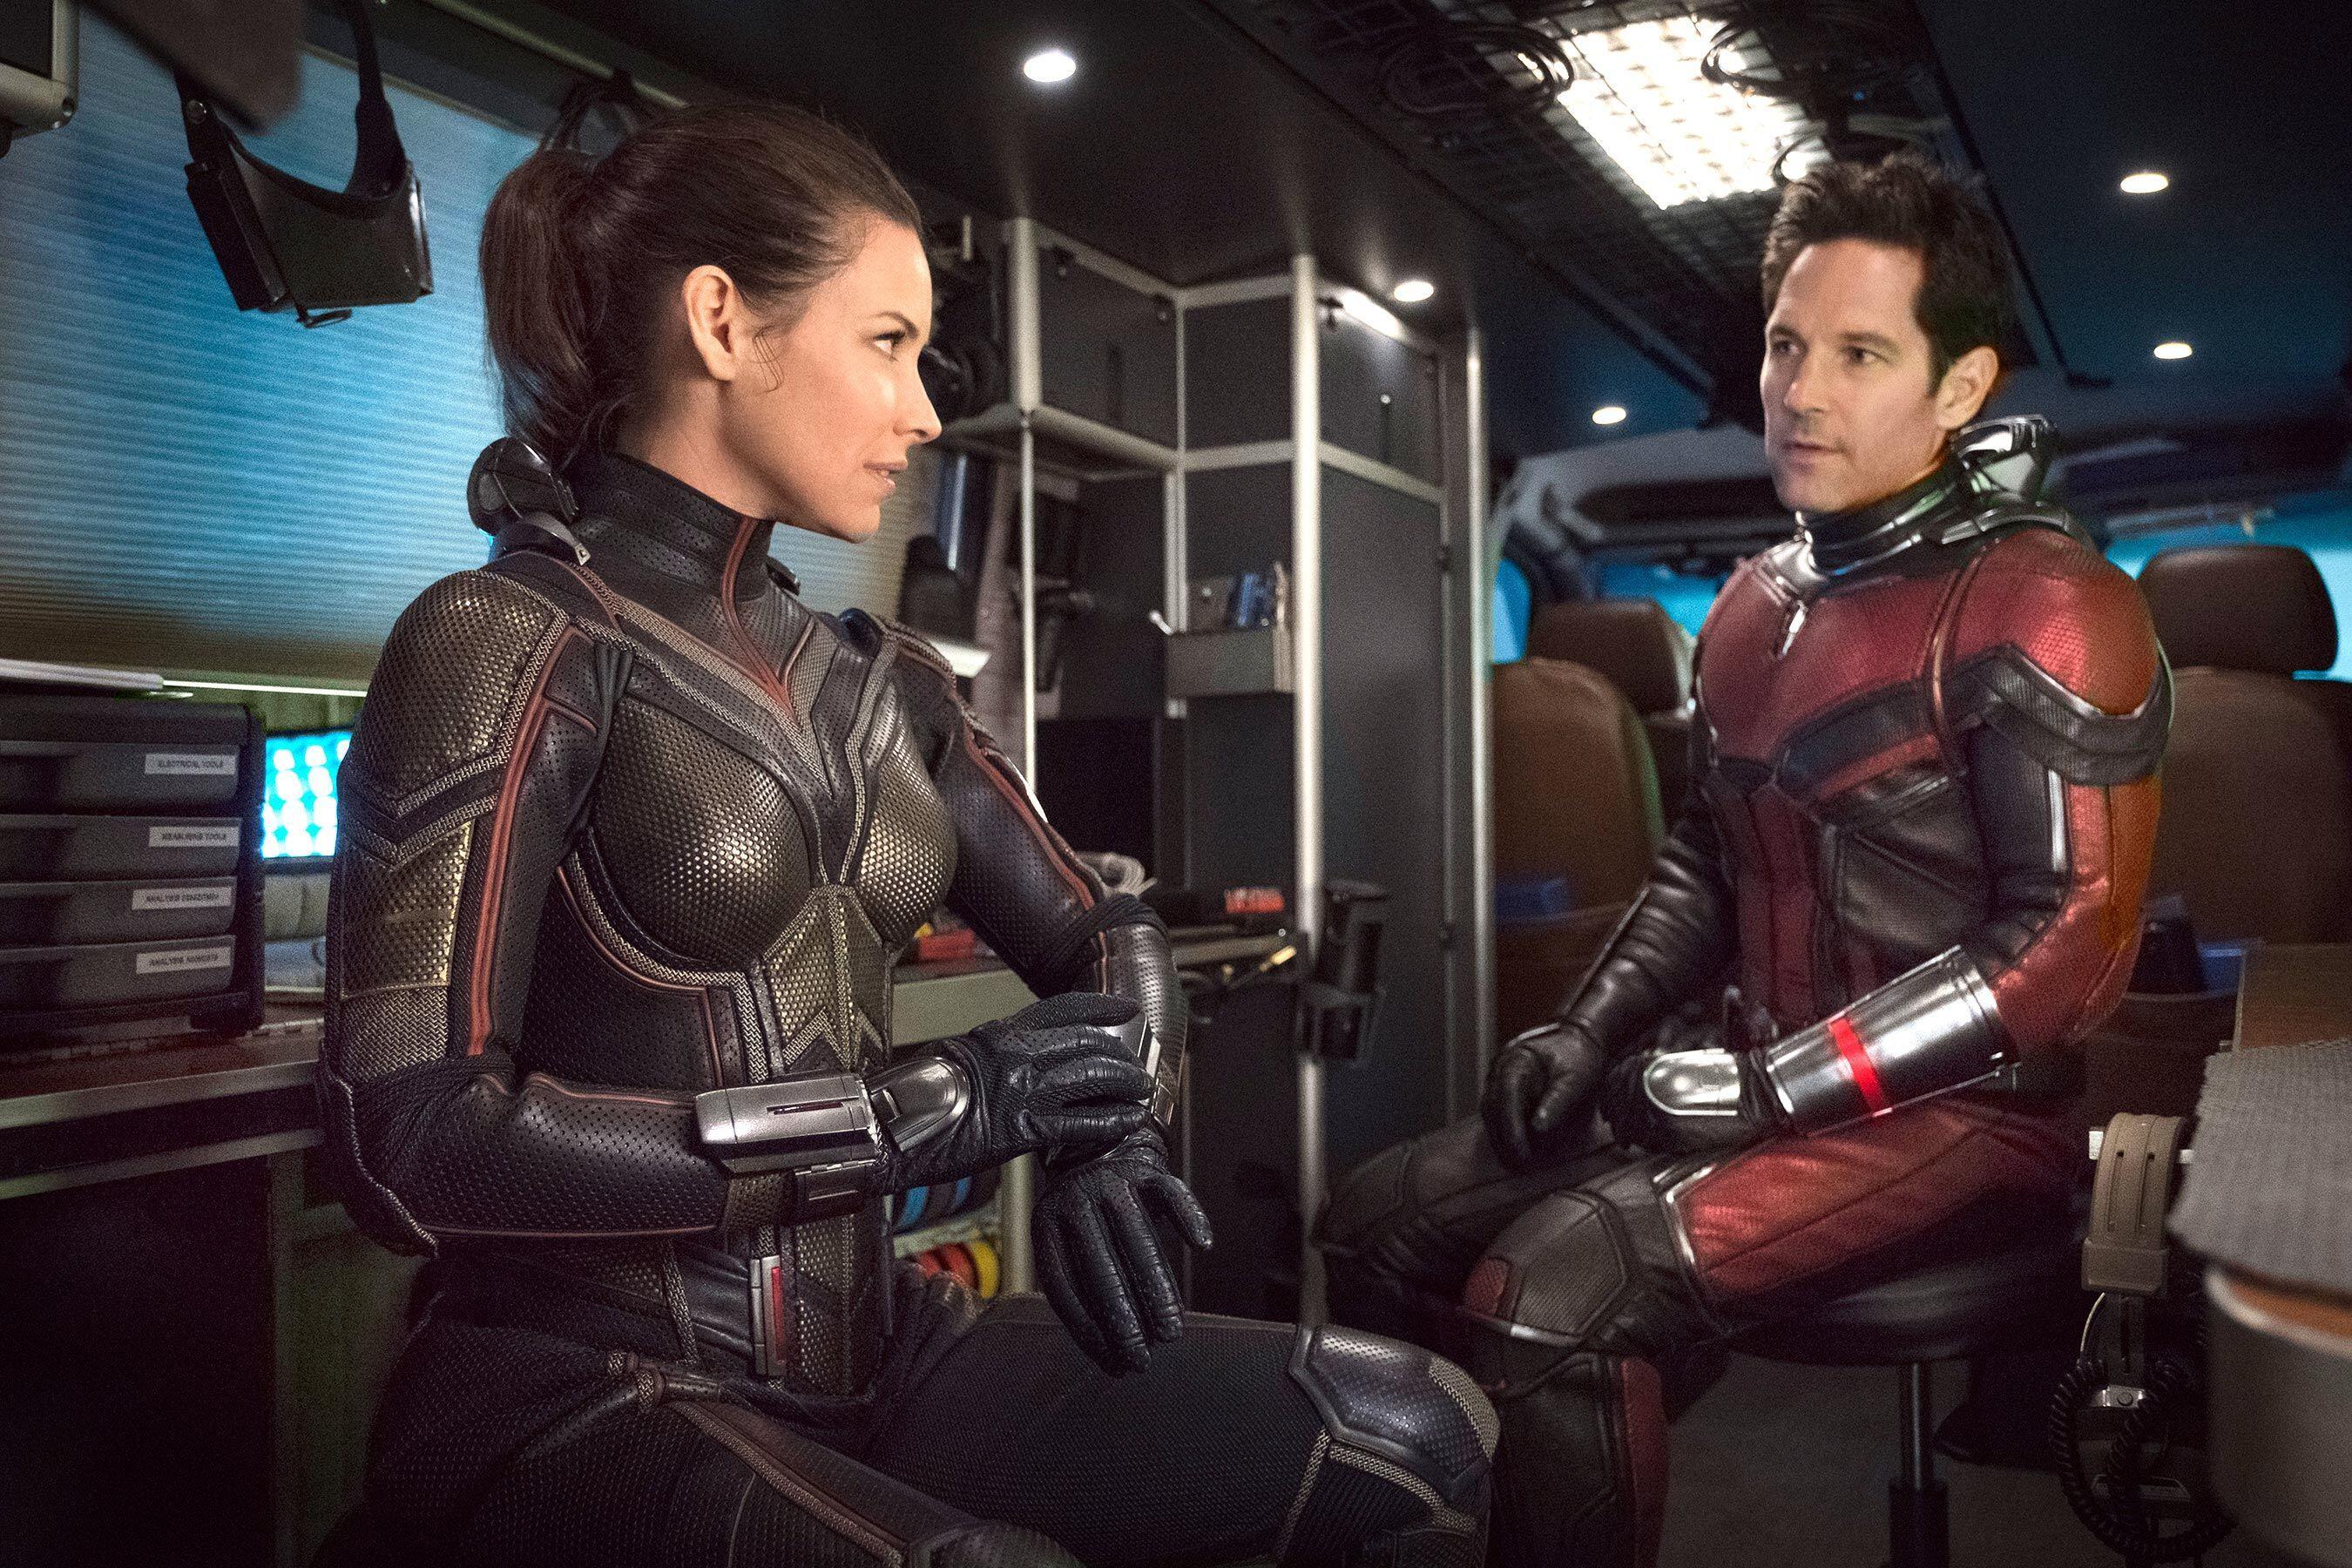 [Review] Ant-Man and the Wasp, Ketika Keluarga di Atas Segalanya